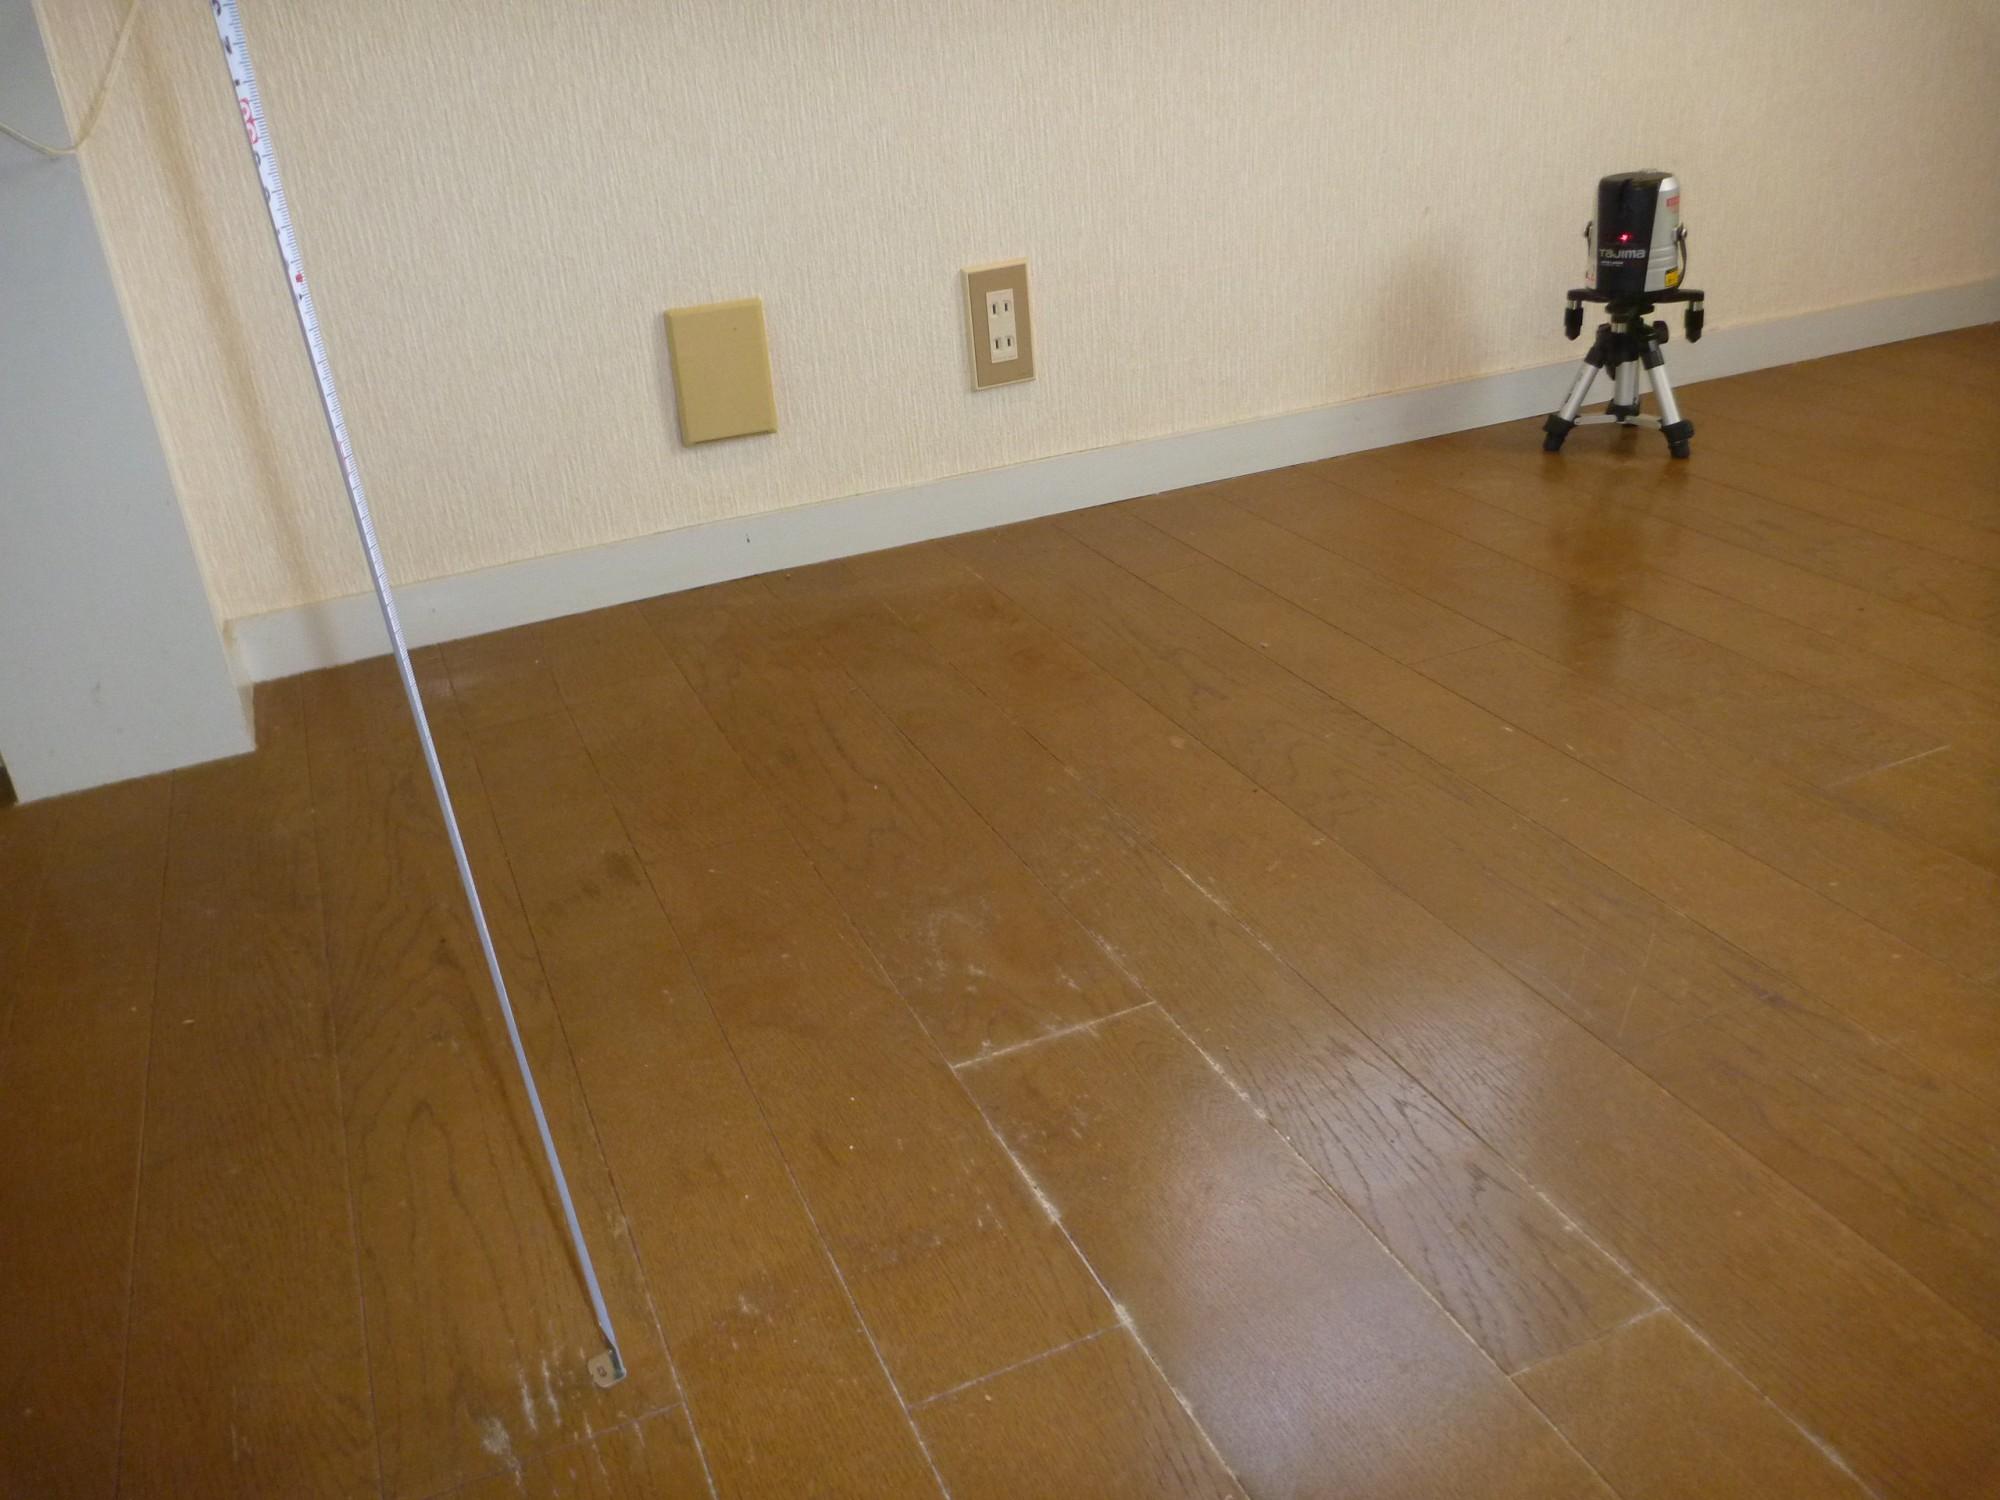 中古住宅 床の傾斜測定